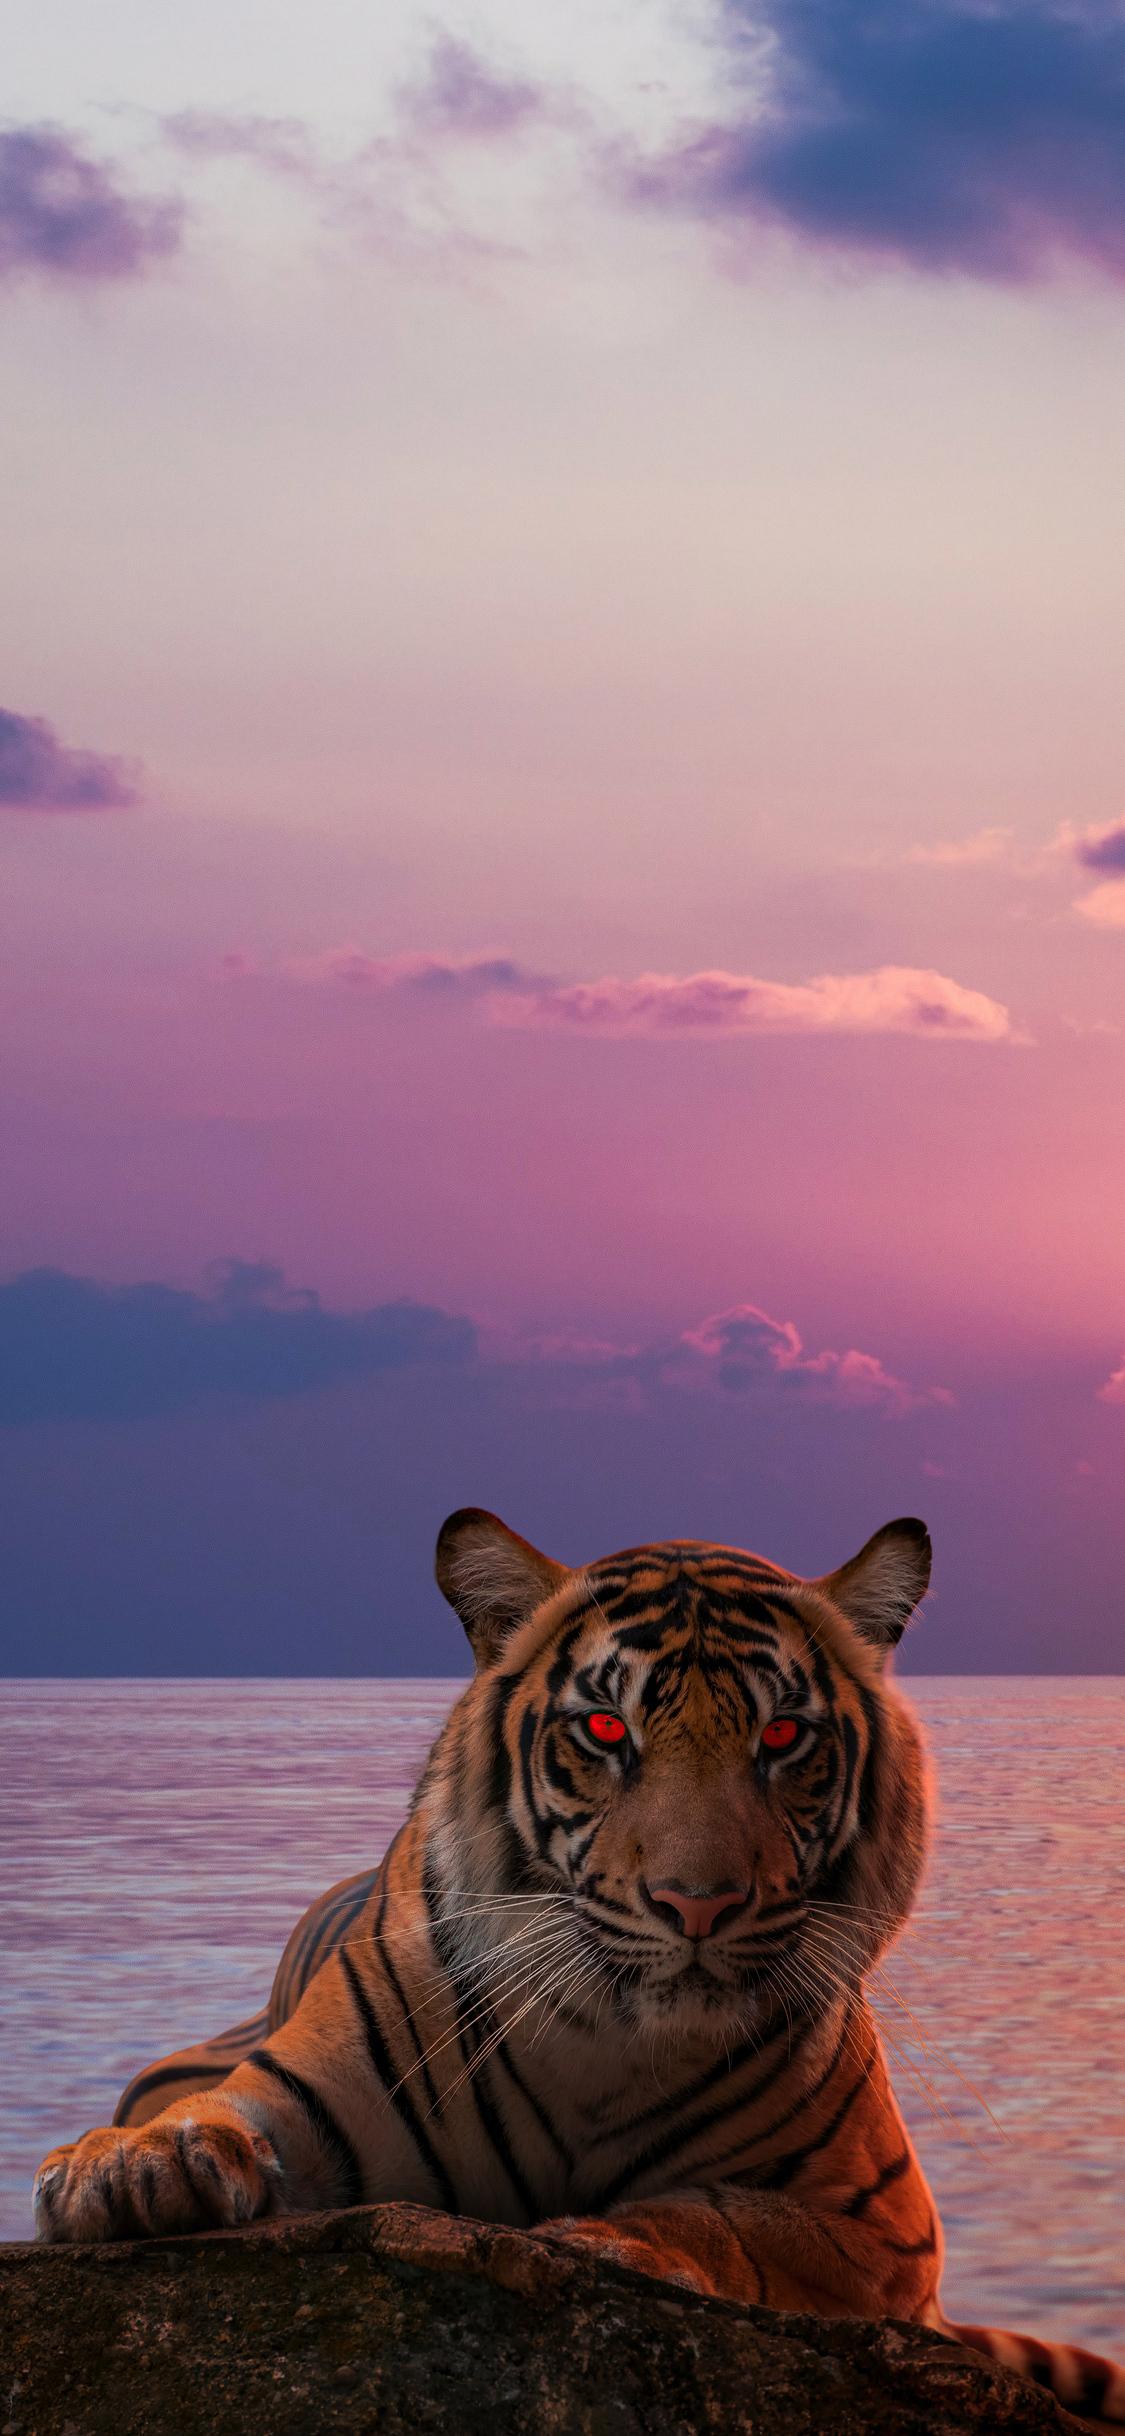 tiger-glowing-red-eyes-5k-yw.jpg